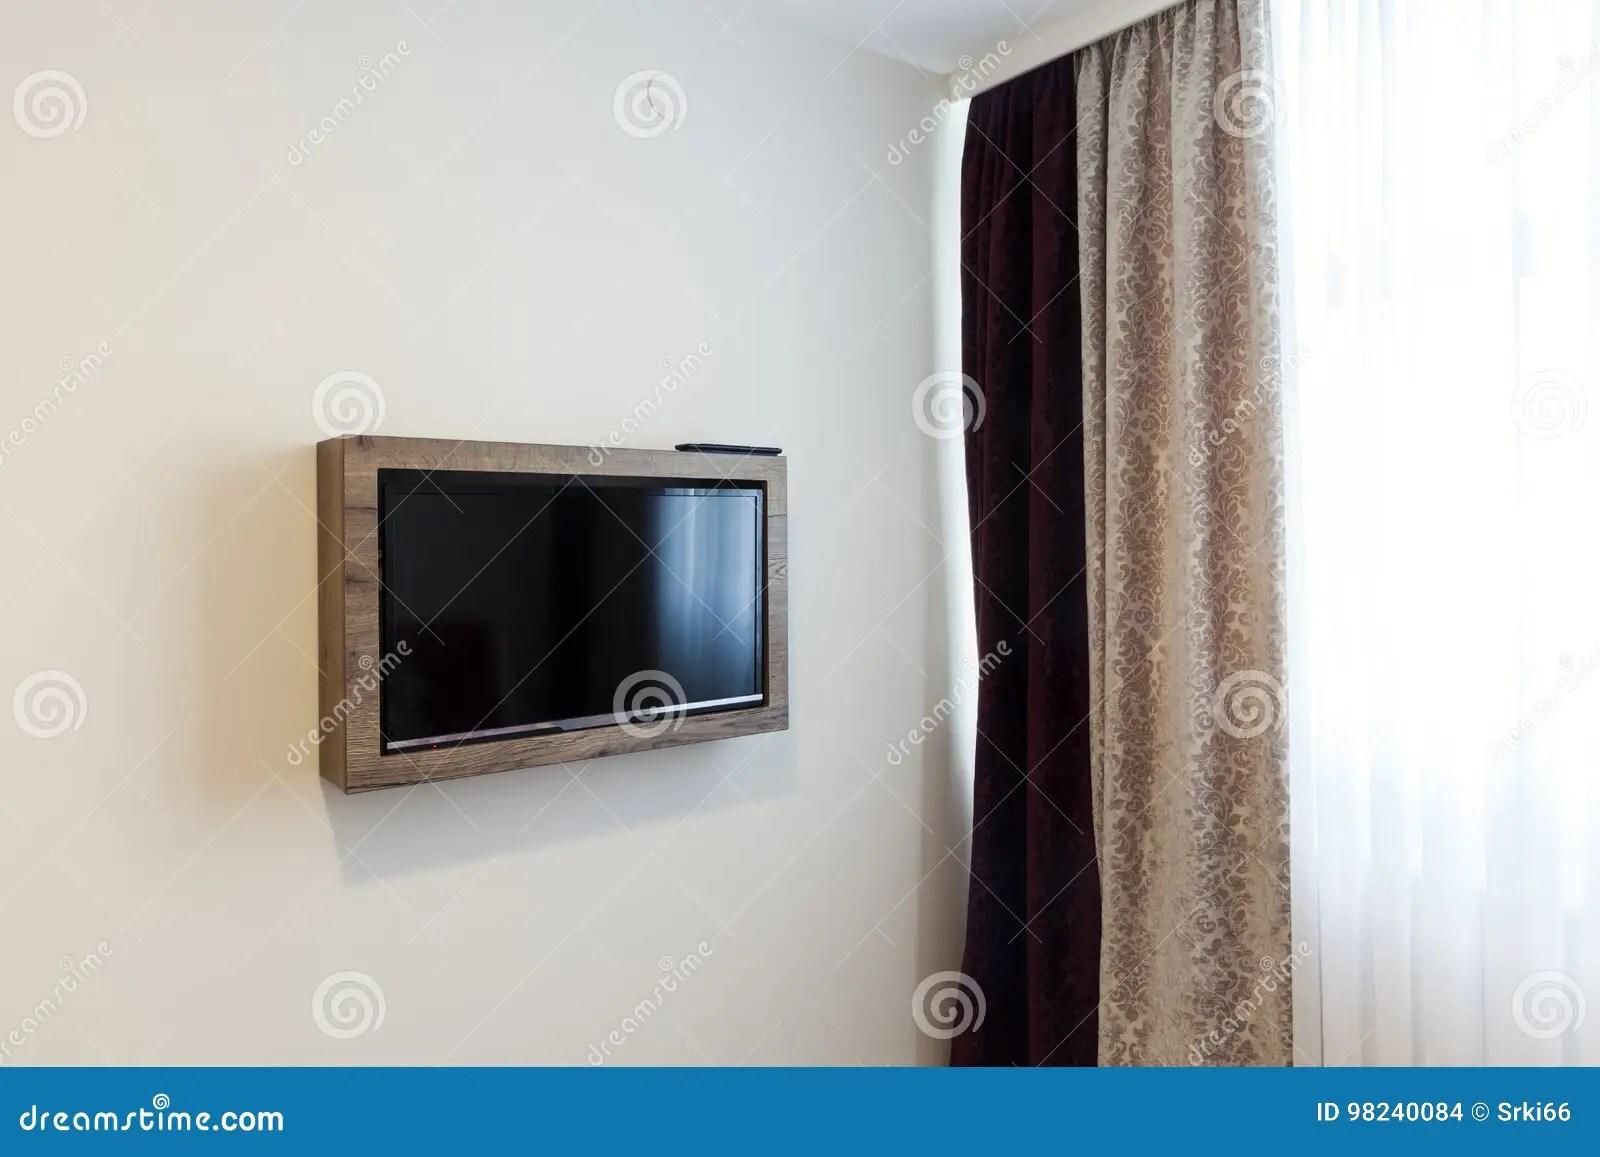 https fr dreamstime com photo stock tv mur image98240084